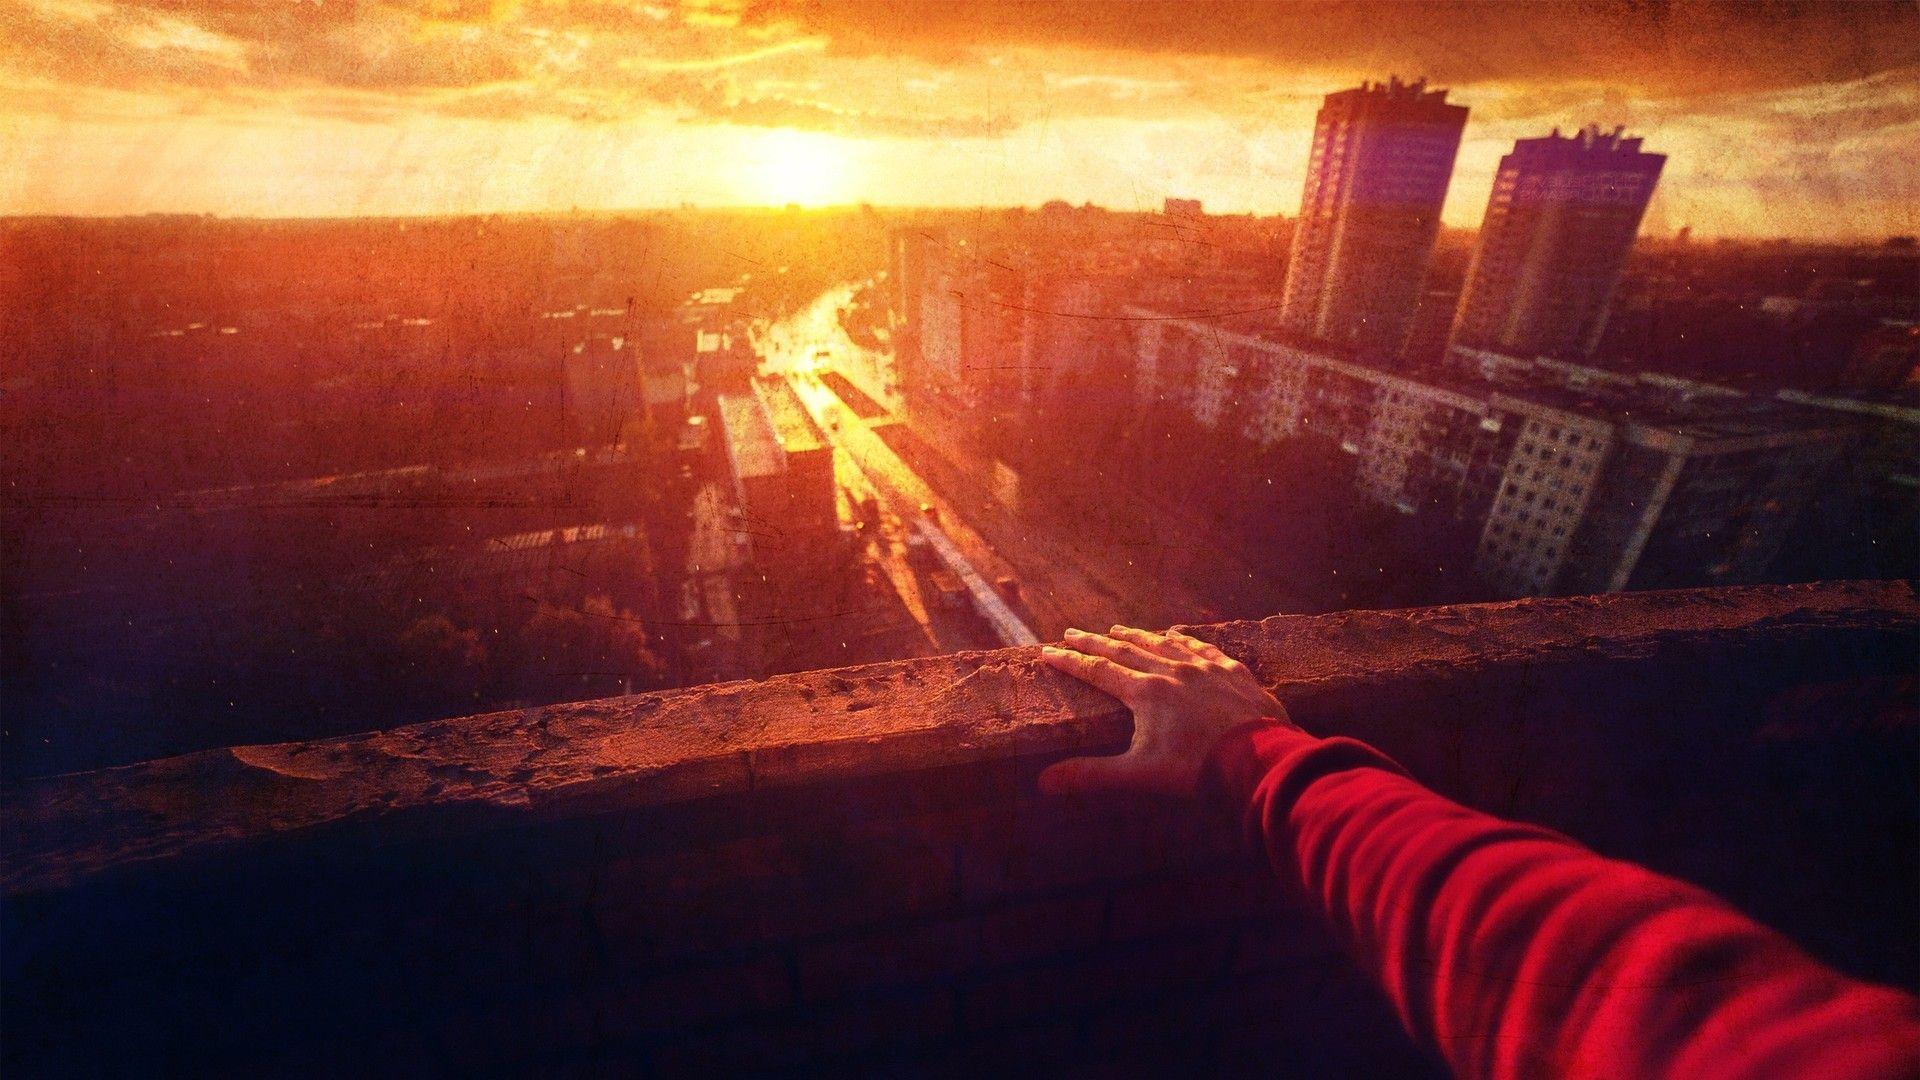 City Sunset Wallpaper 3462